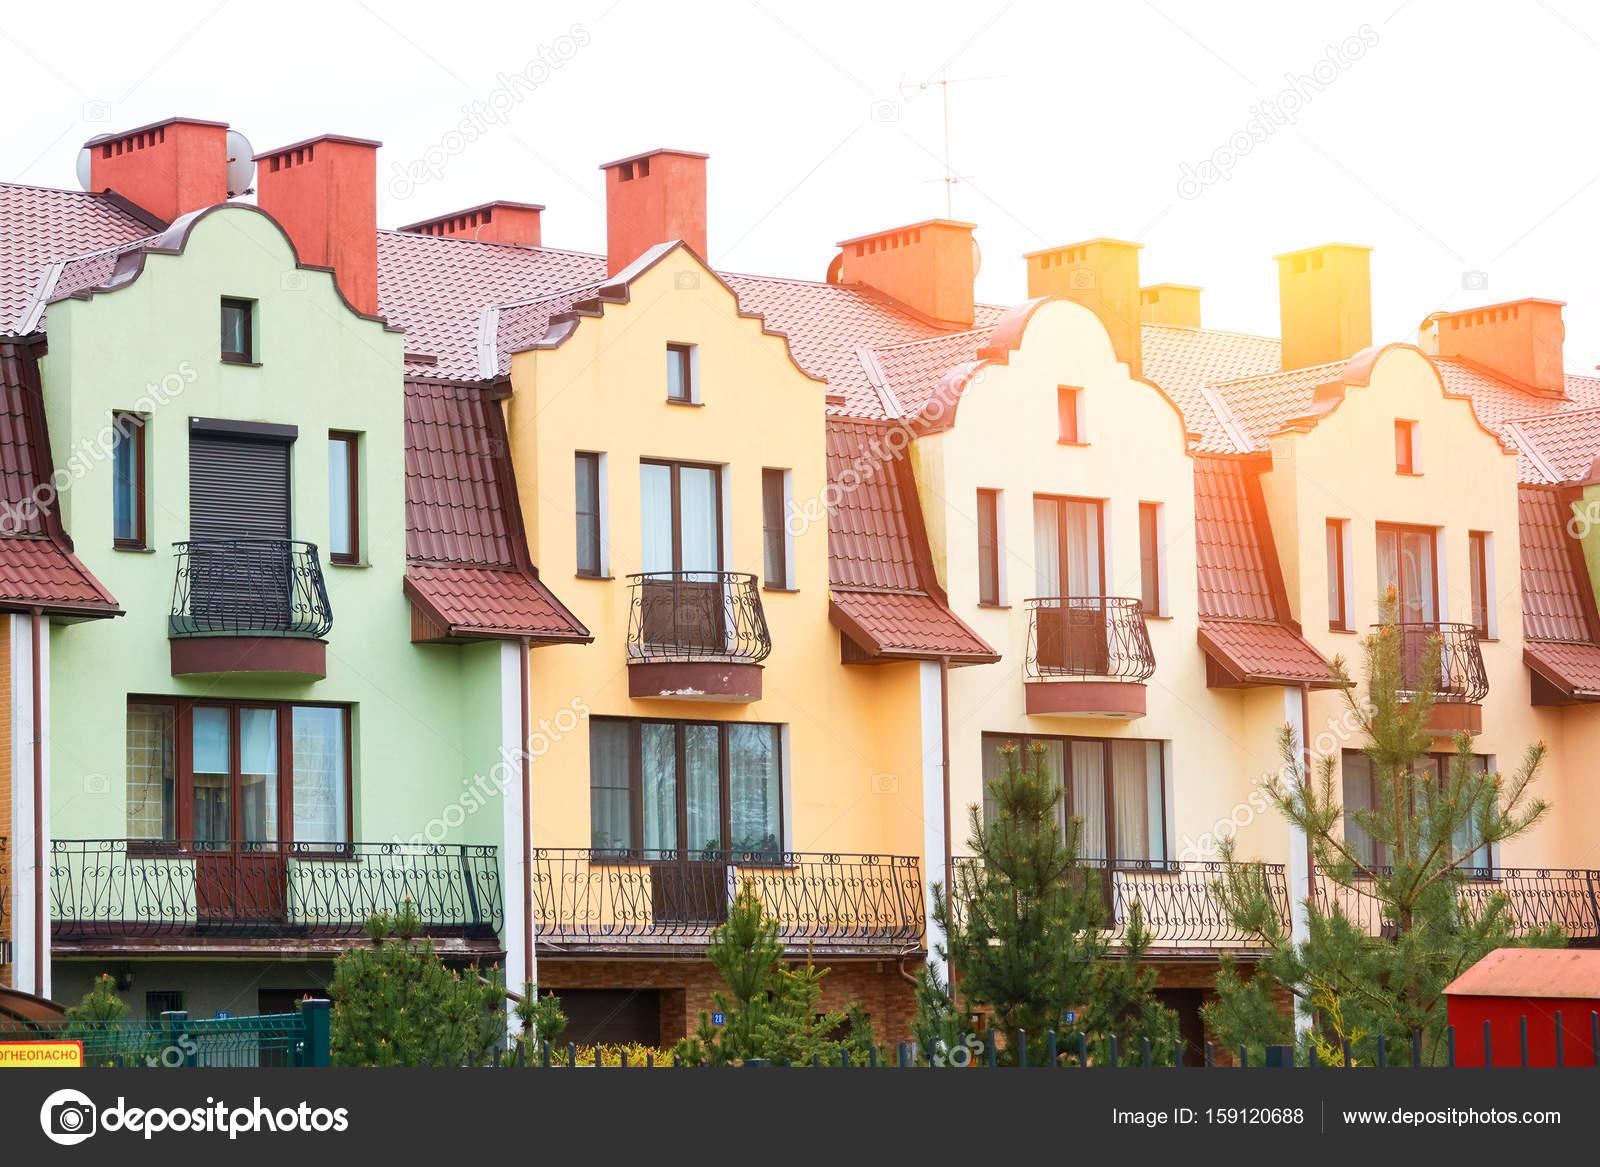 Bunte Häuser Fassaden Farben blassen Pastell in Europa — Stockfoto ...